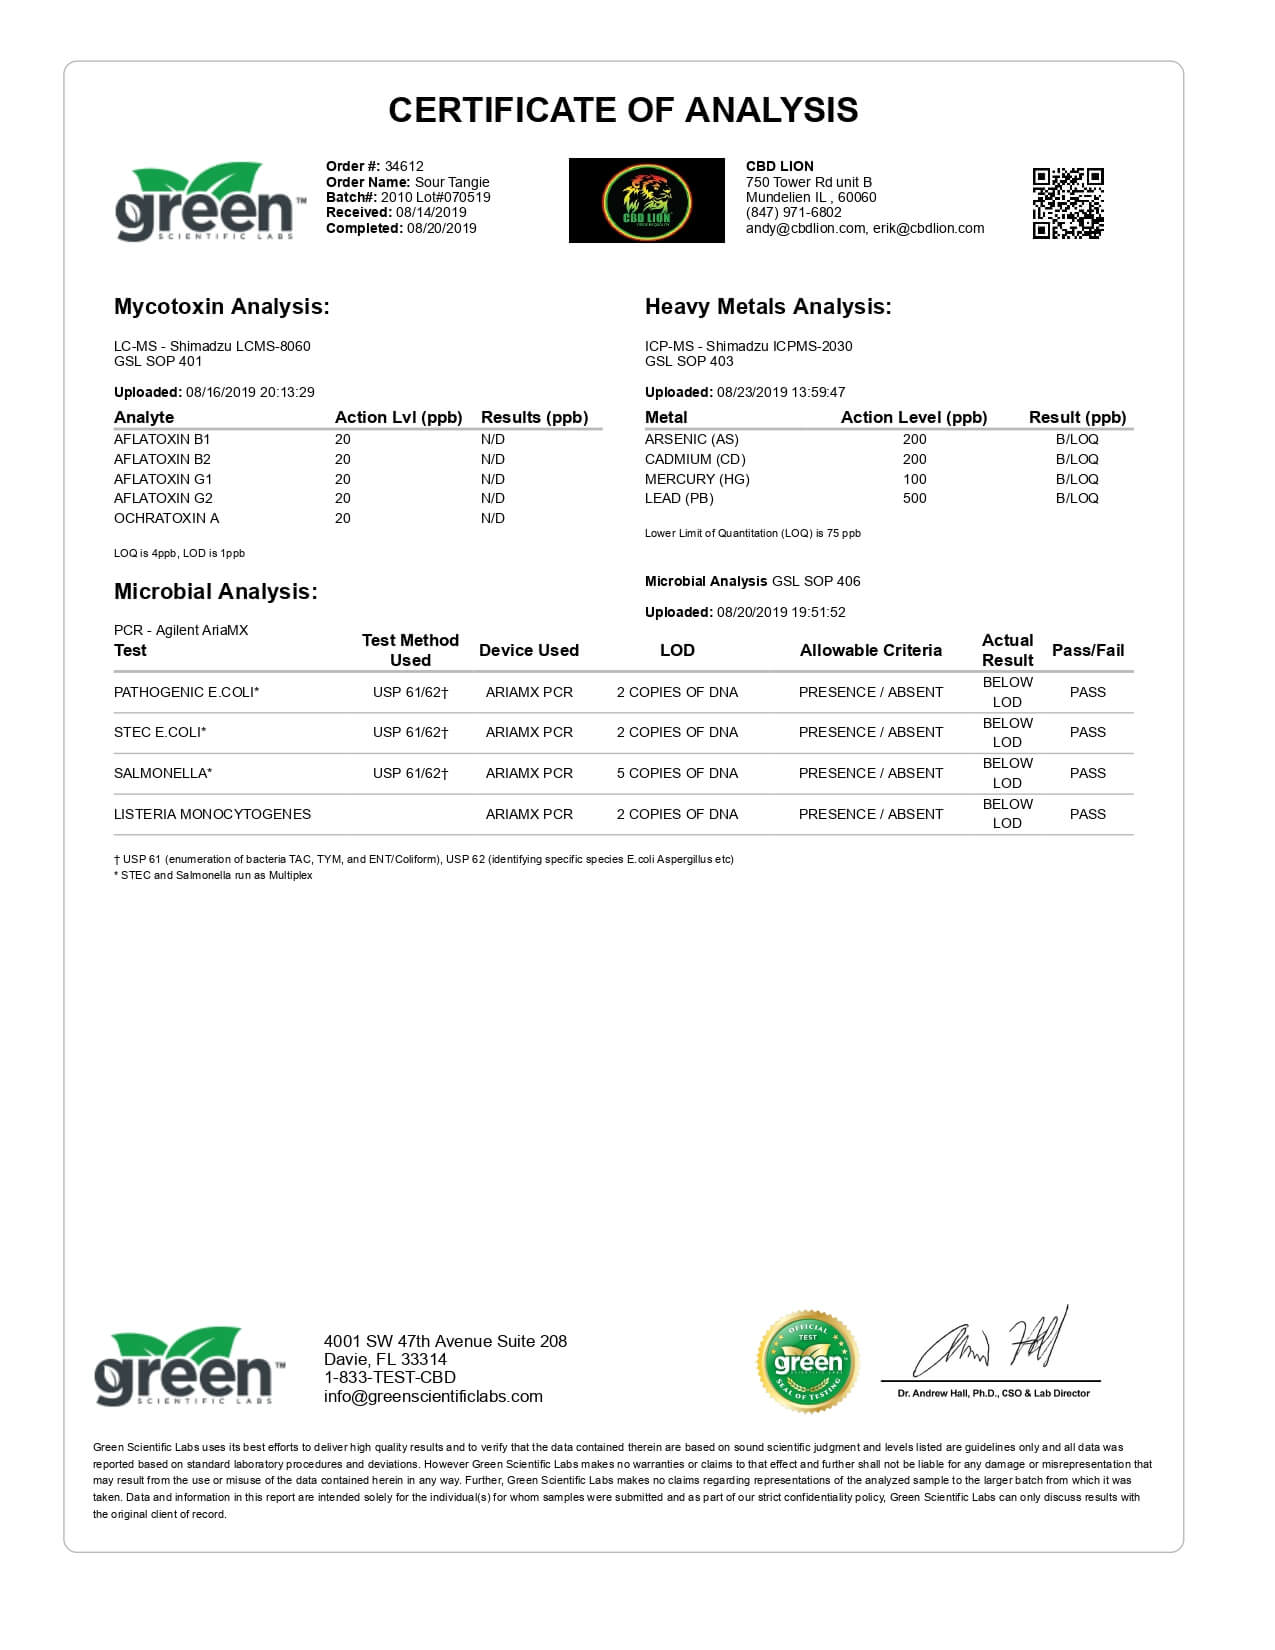 CBD Lion CBD Concentrate Sour Tangie Shatter 1g Lab Report